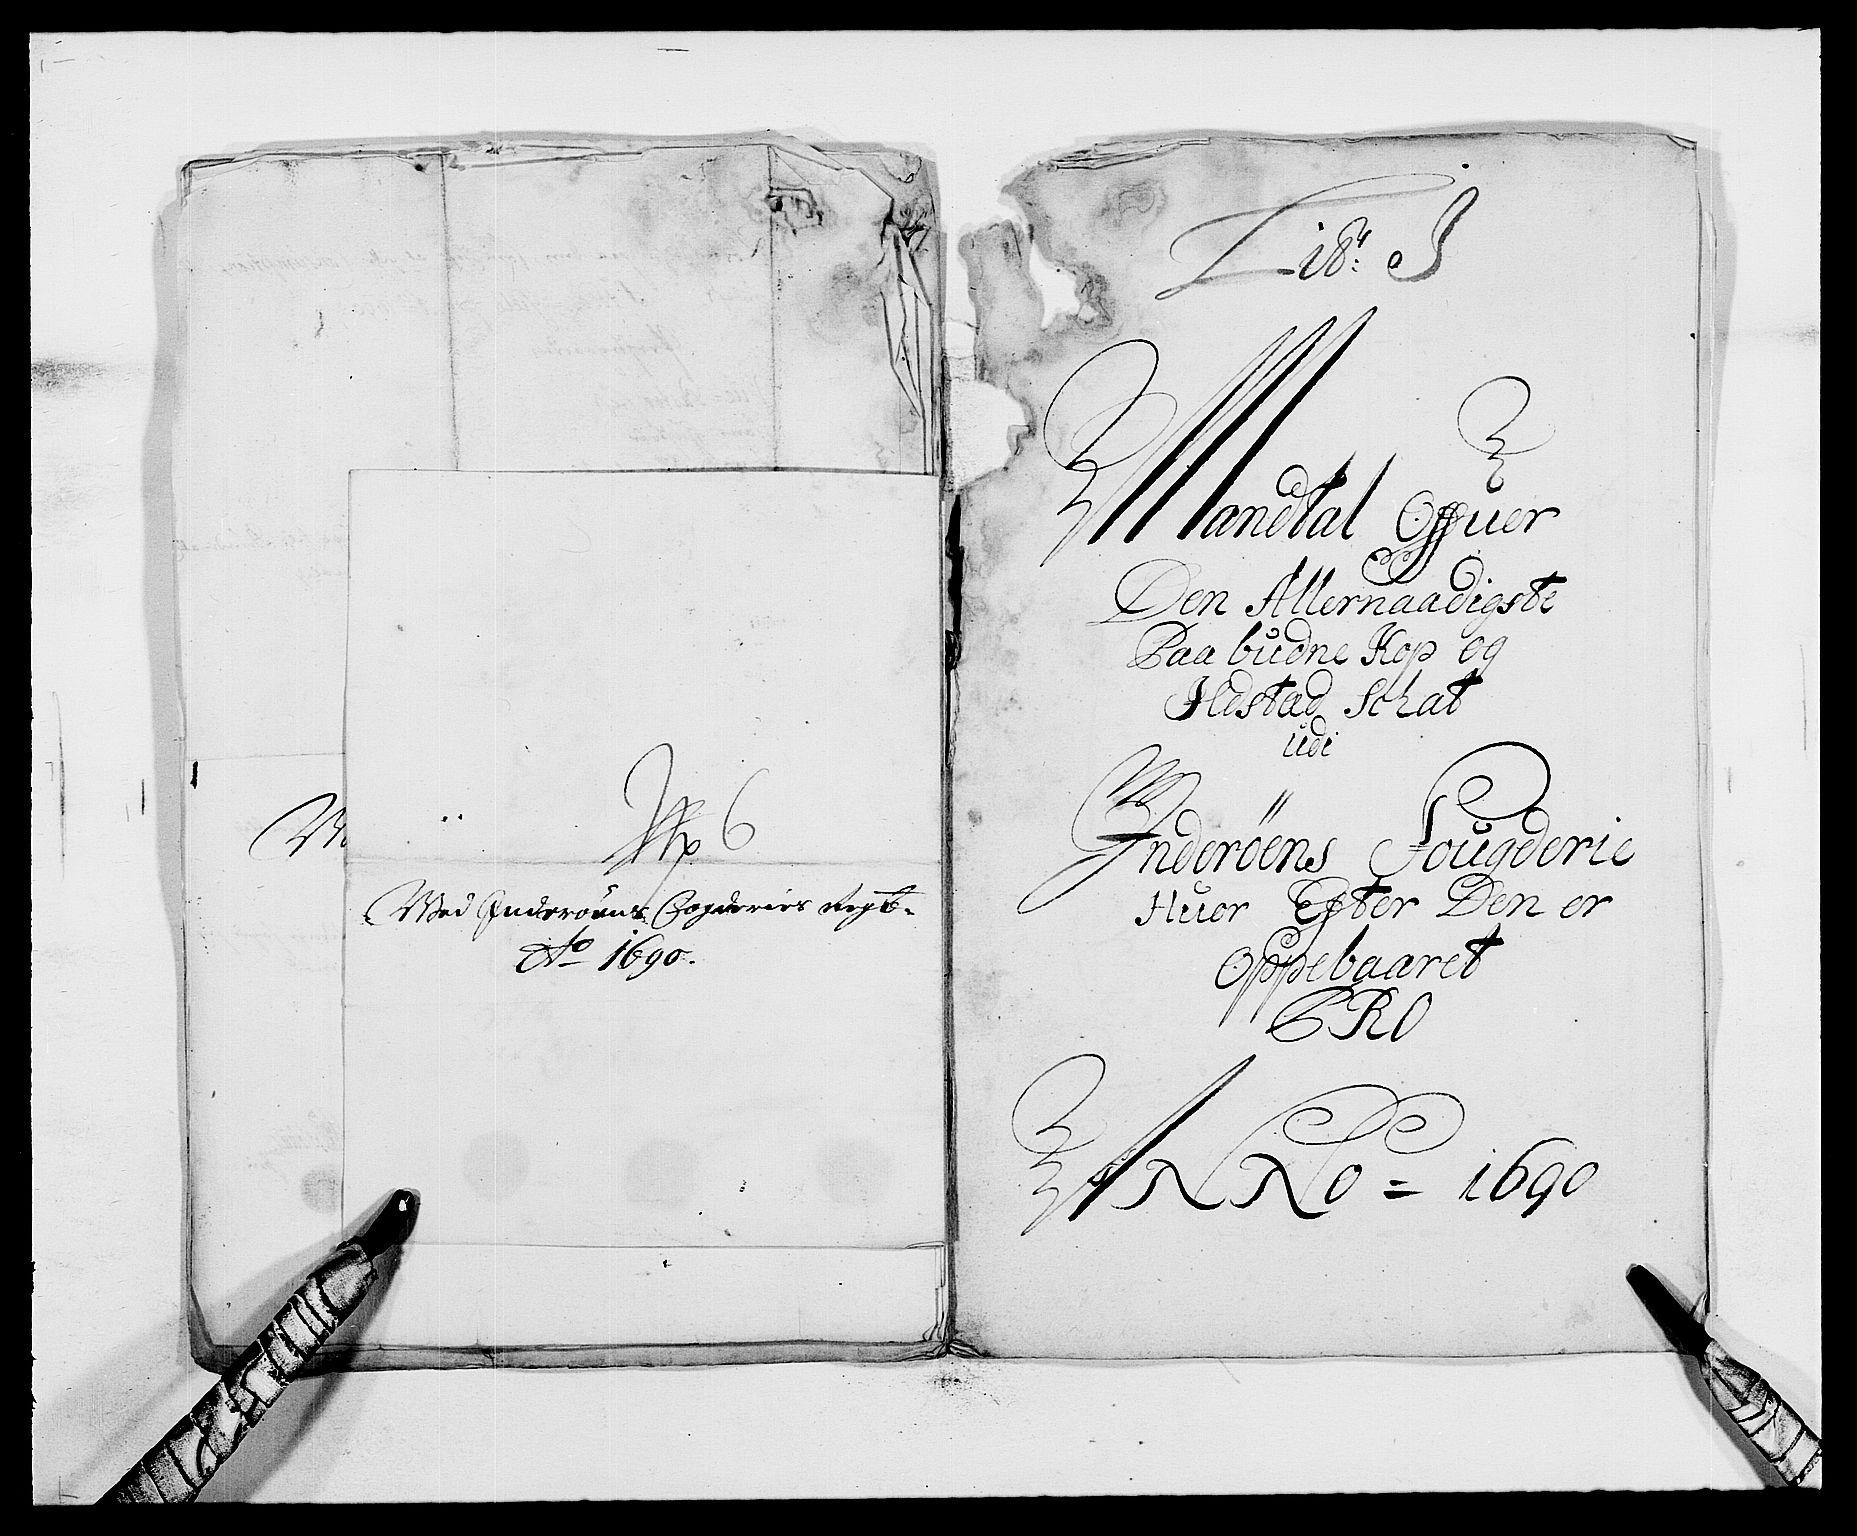 RA, Rentekammeret inntil 1814, Reviderte regnskaper, Fogderegnskap, R63/L4307: Fogderegnskap Inderøy, 1690-1691, s. 126